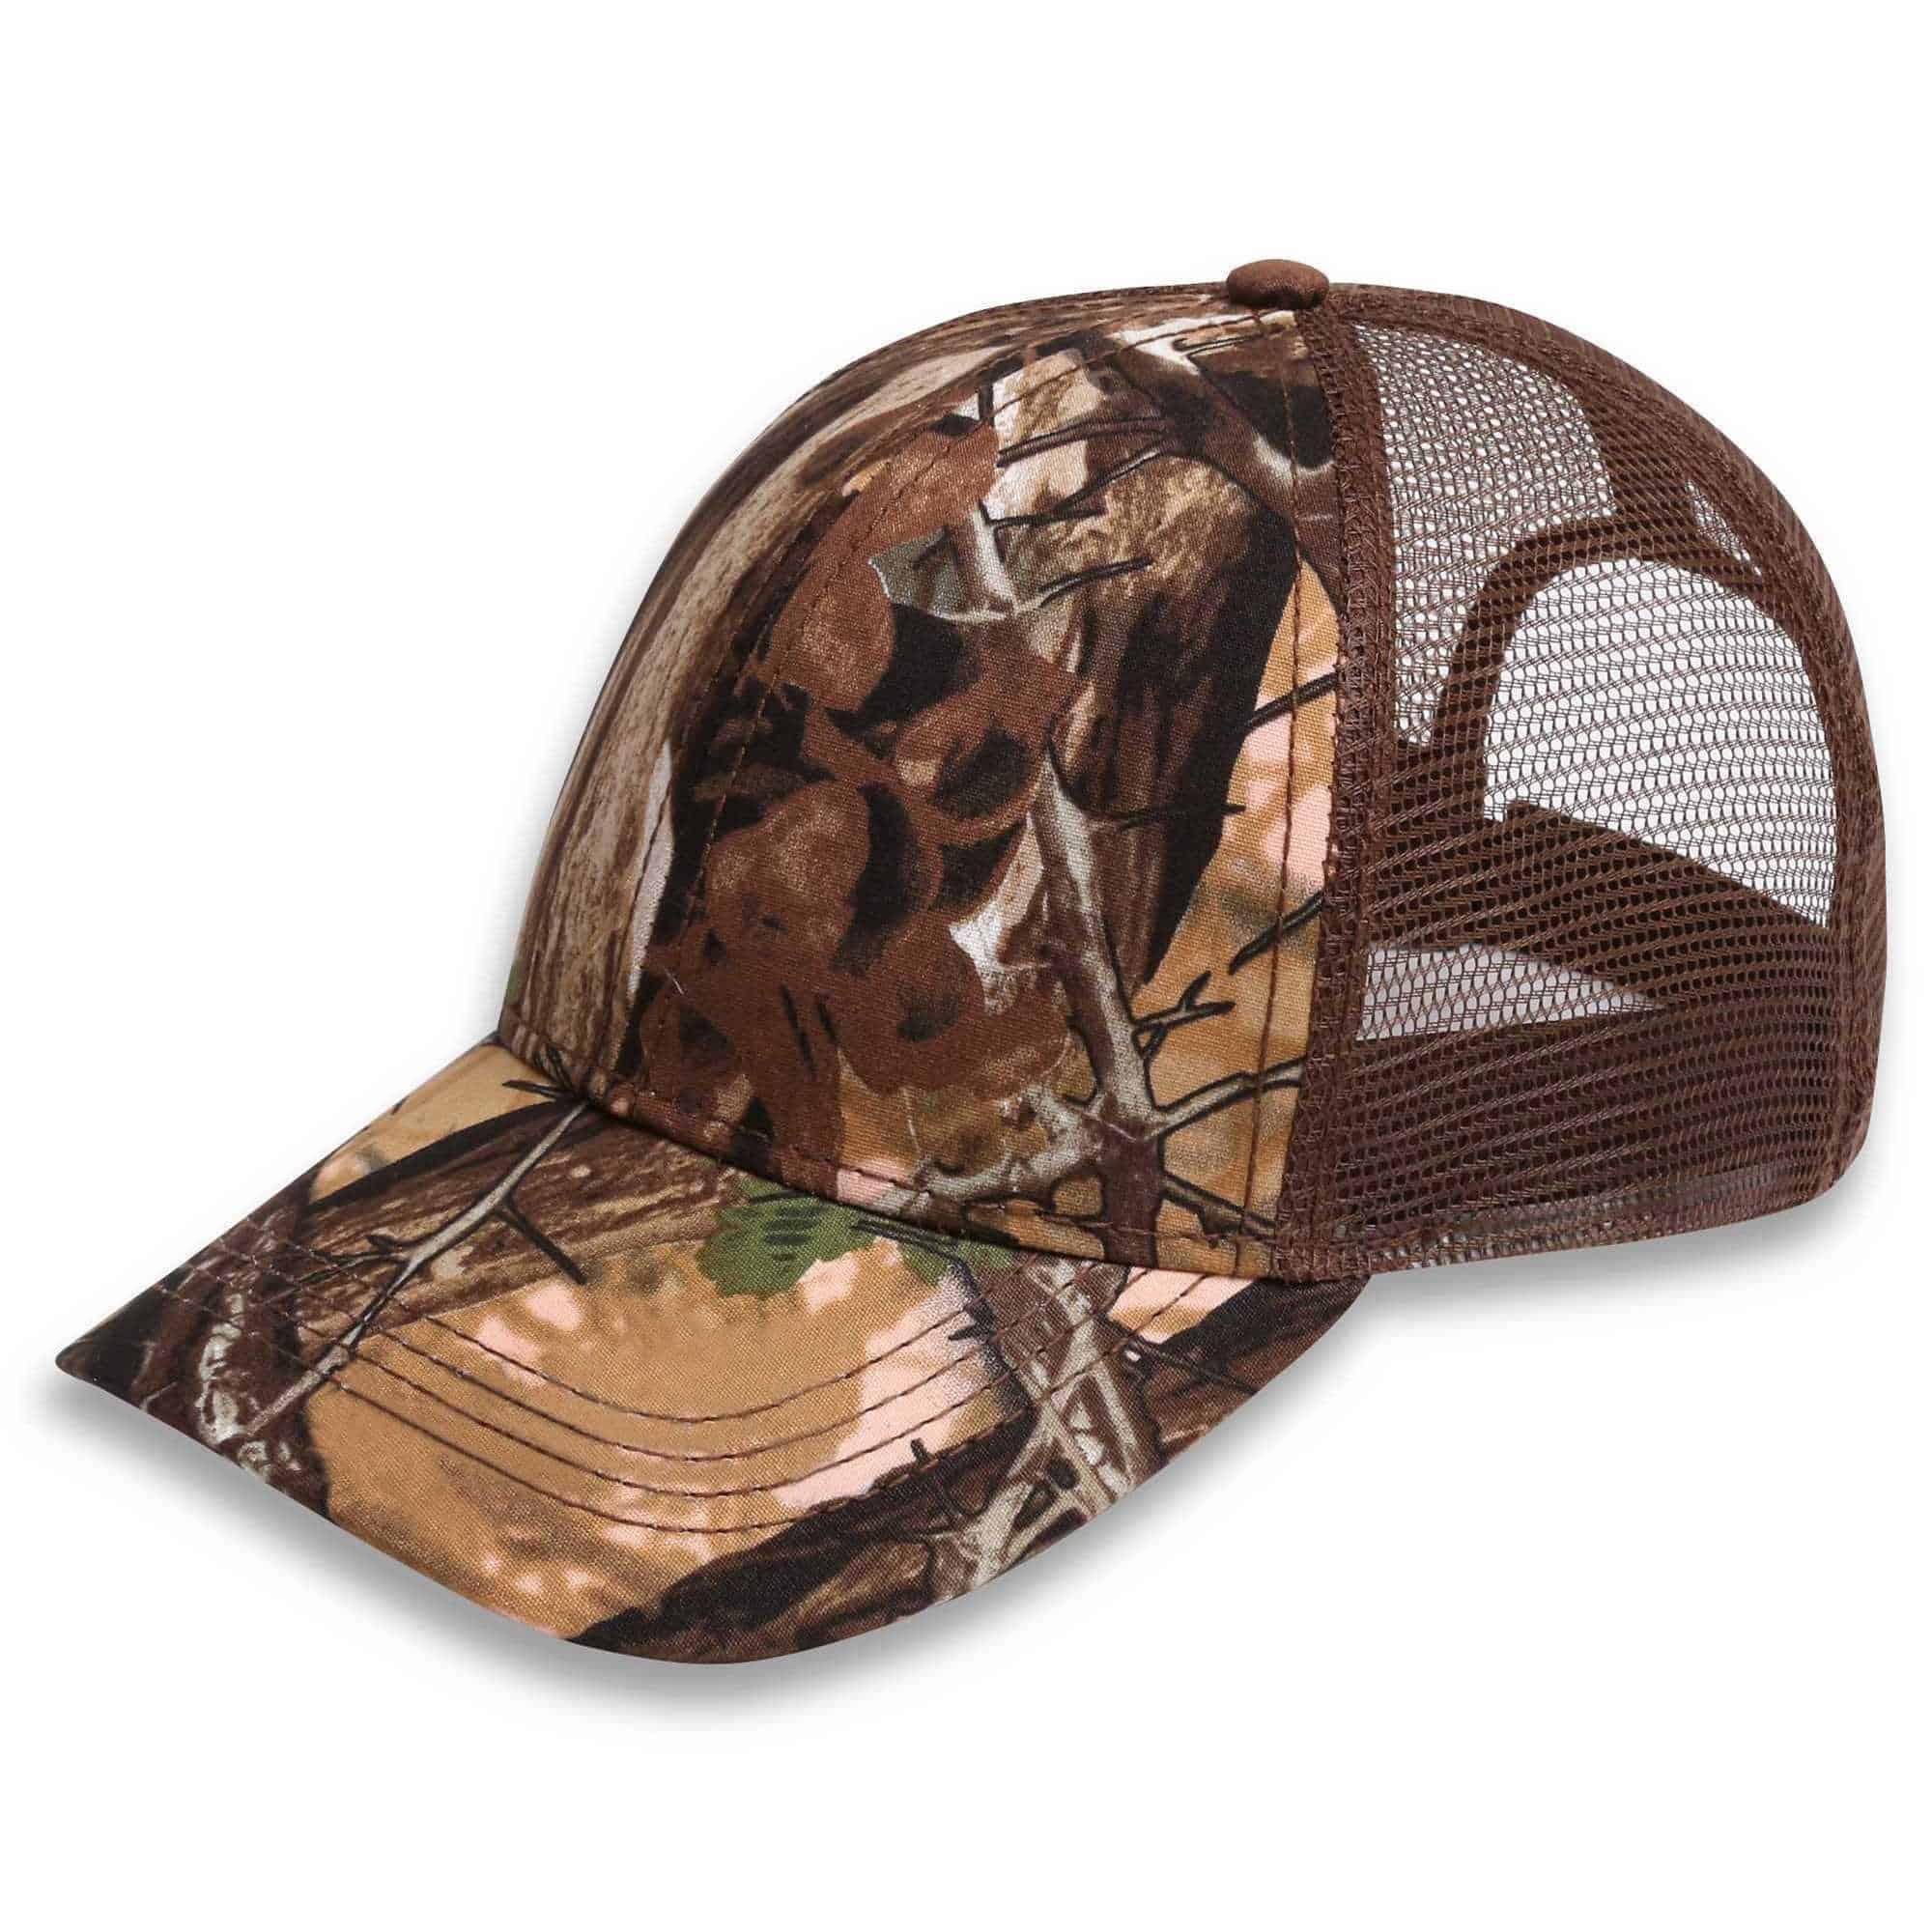 A18604 Acacia Thorn Camo Trucker Headwear and Accessories